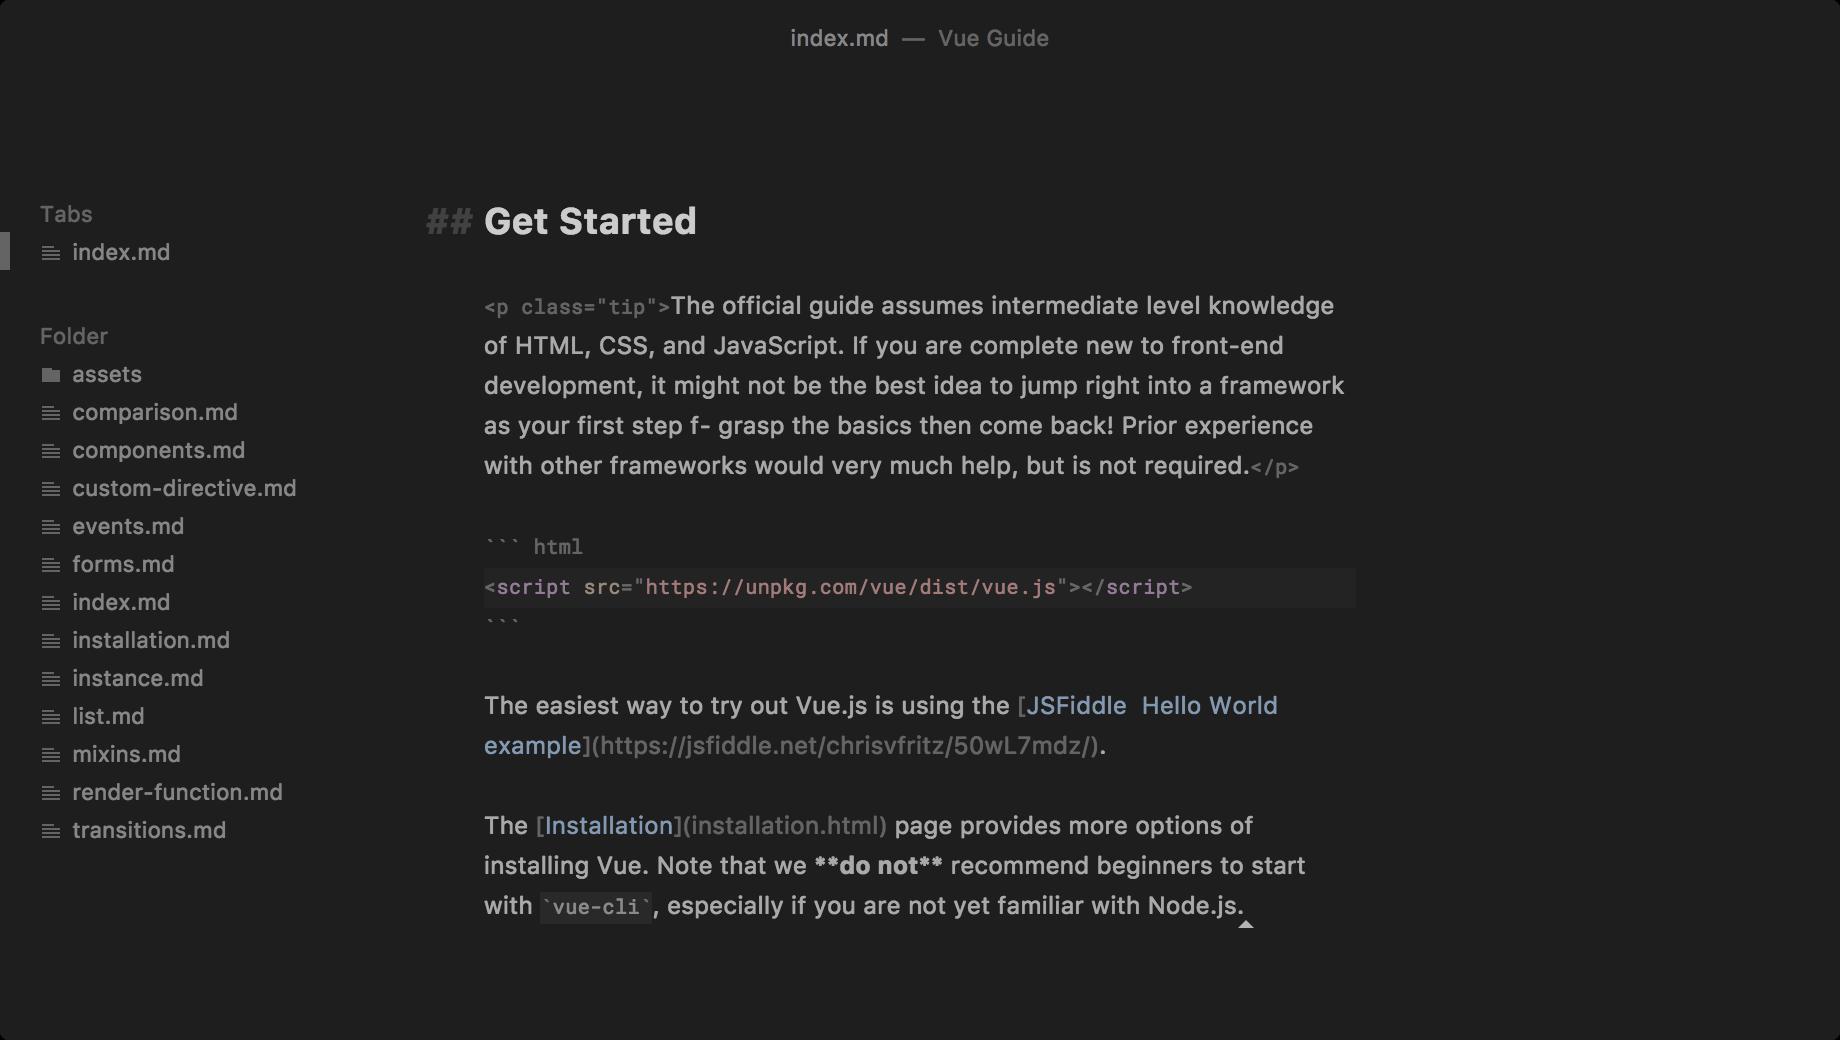 Caret - Markdown Editor for Mac / Windows / Linux